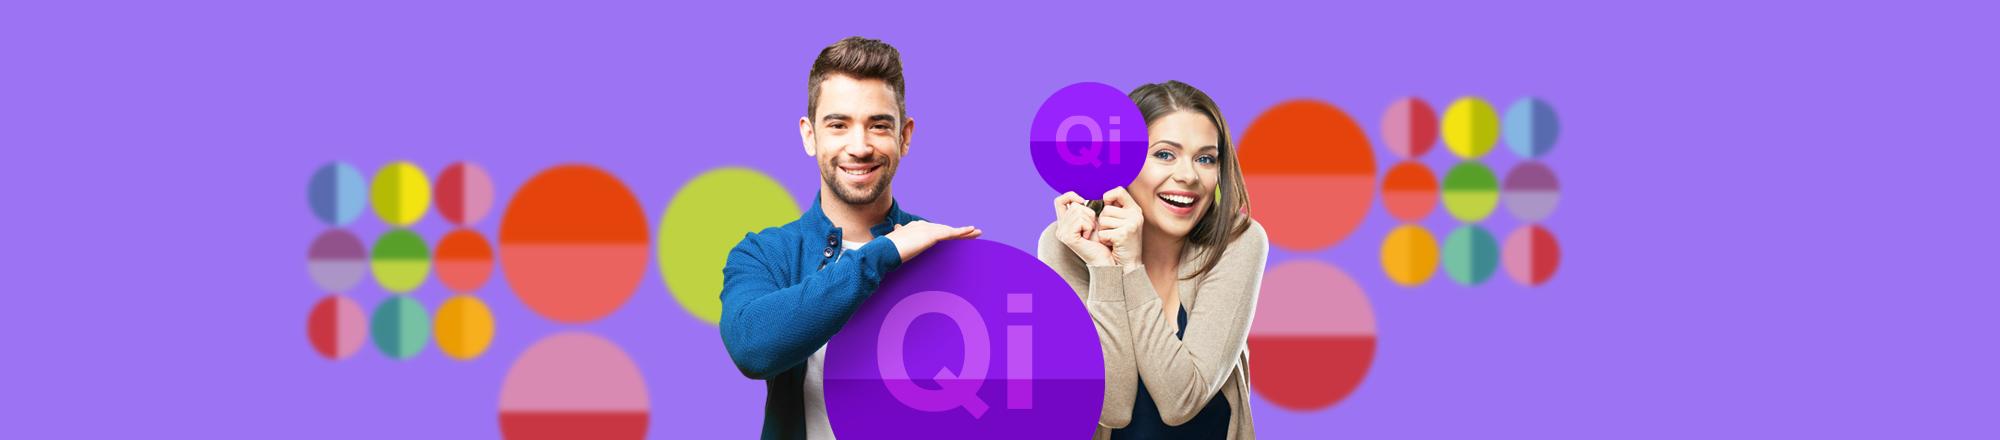 Qi banner